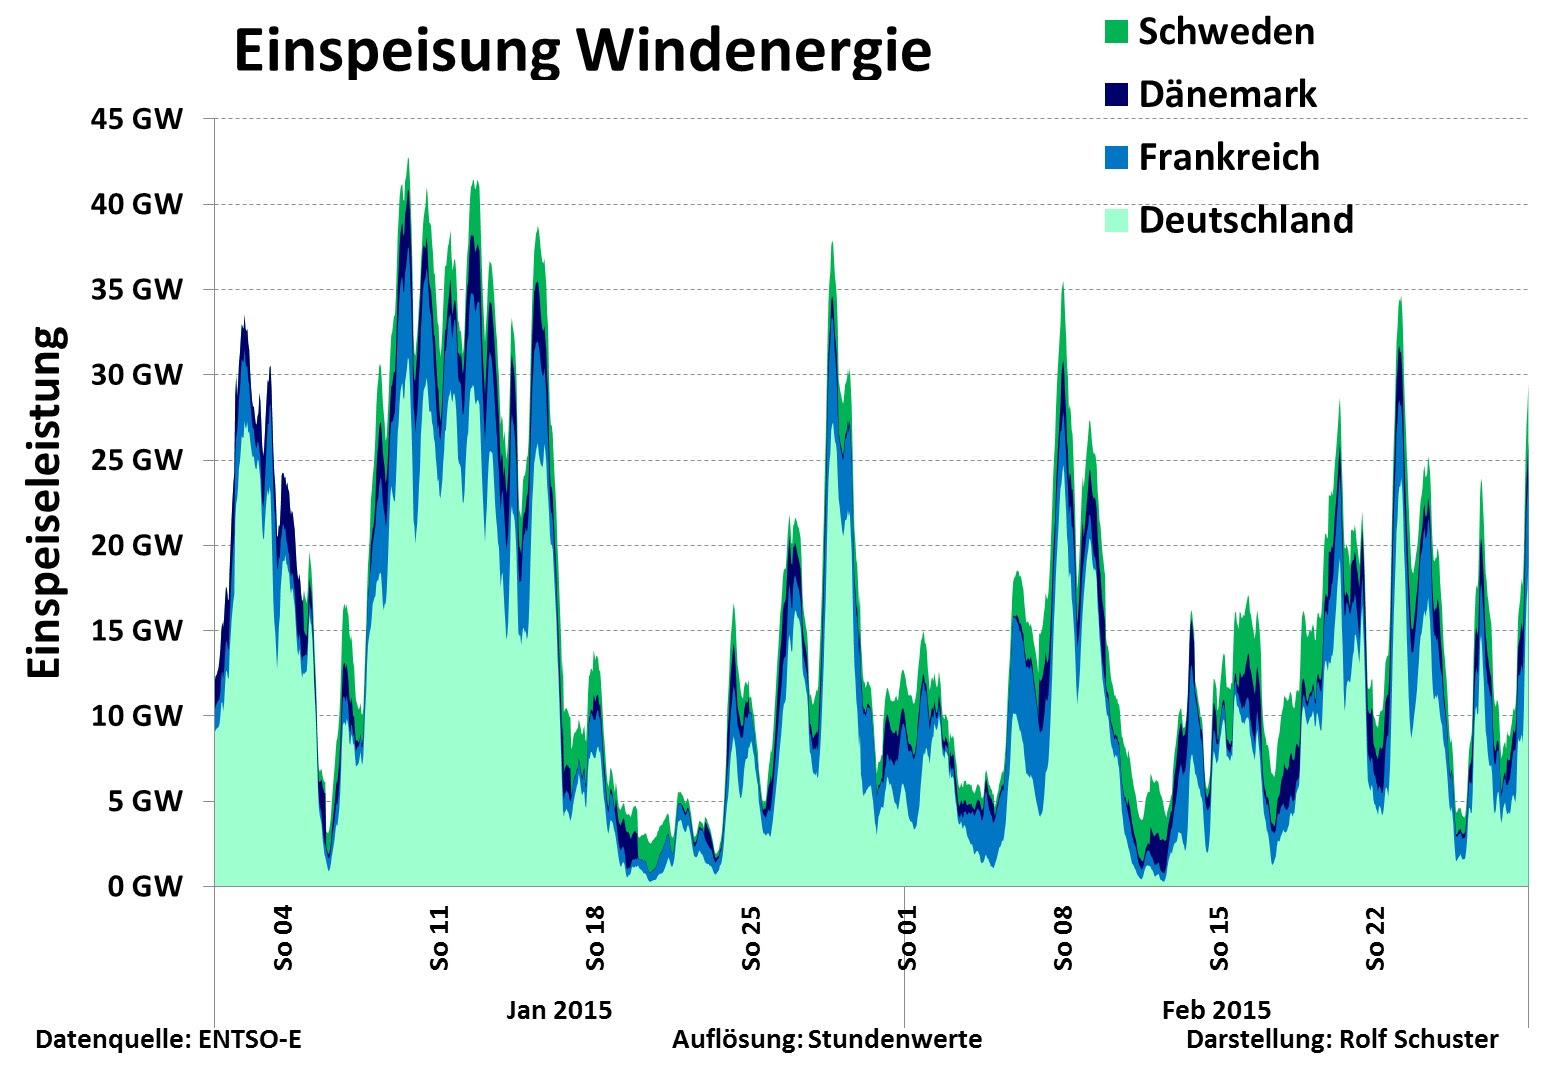 http://www.science-skeptical.de/wp-content/uploads/2015/03/Einspeisung-Wind-De-Se-Dk-Fr.jpg